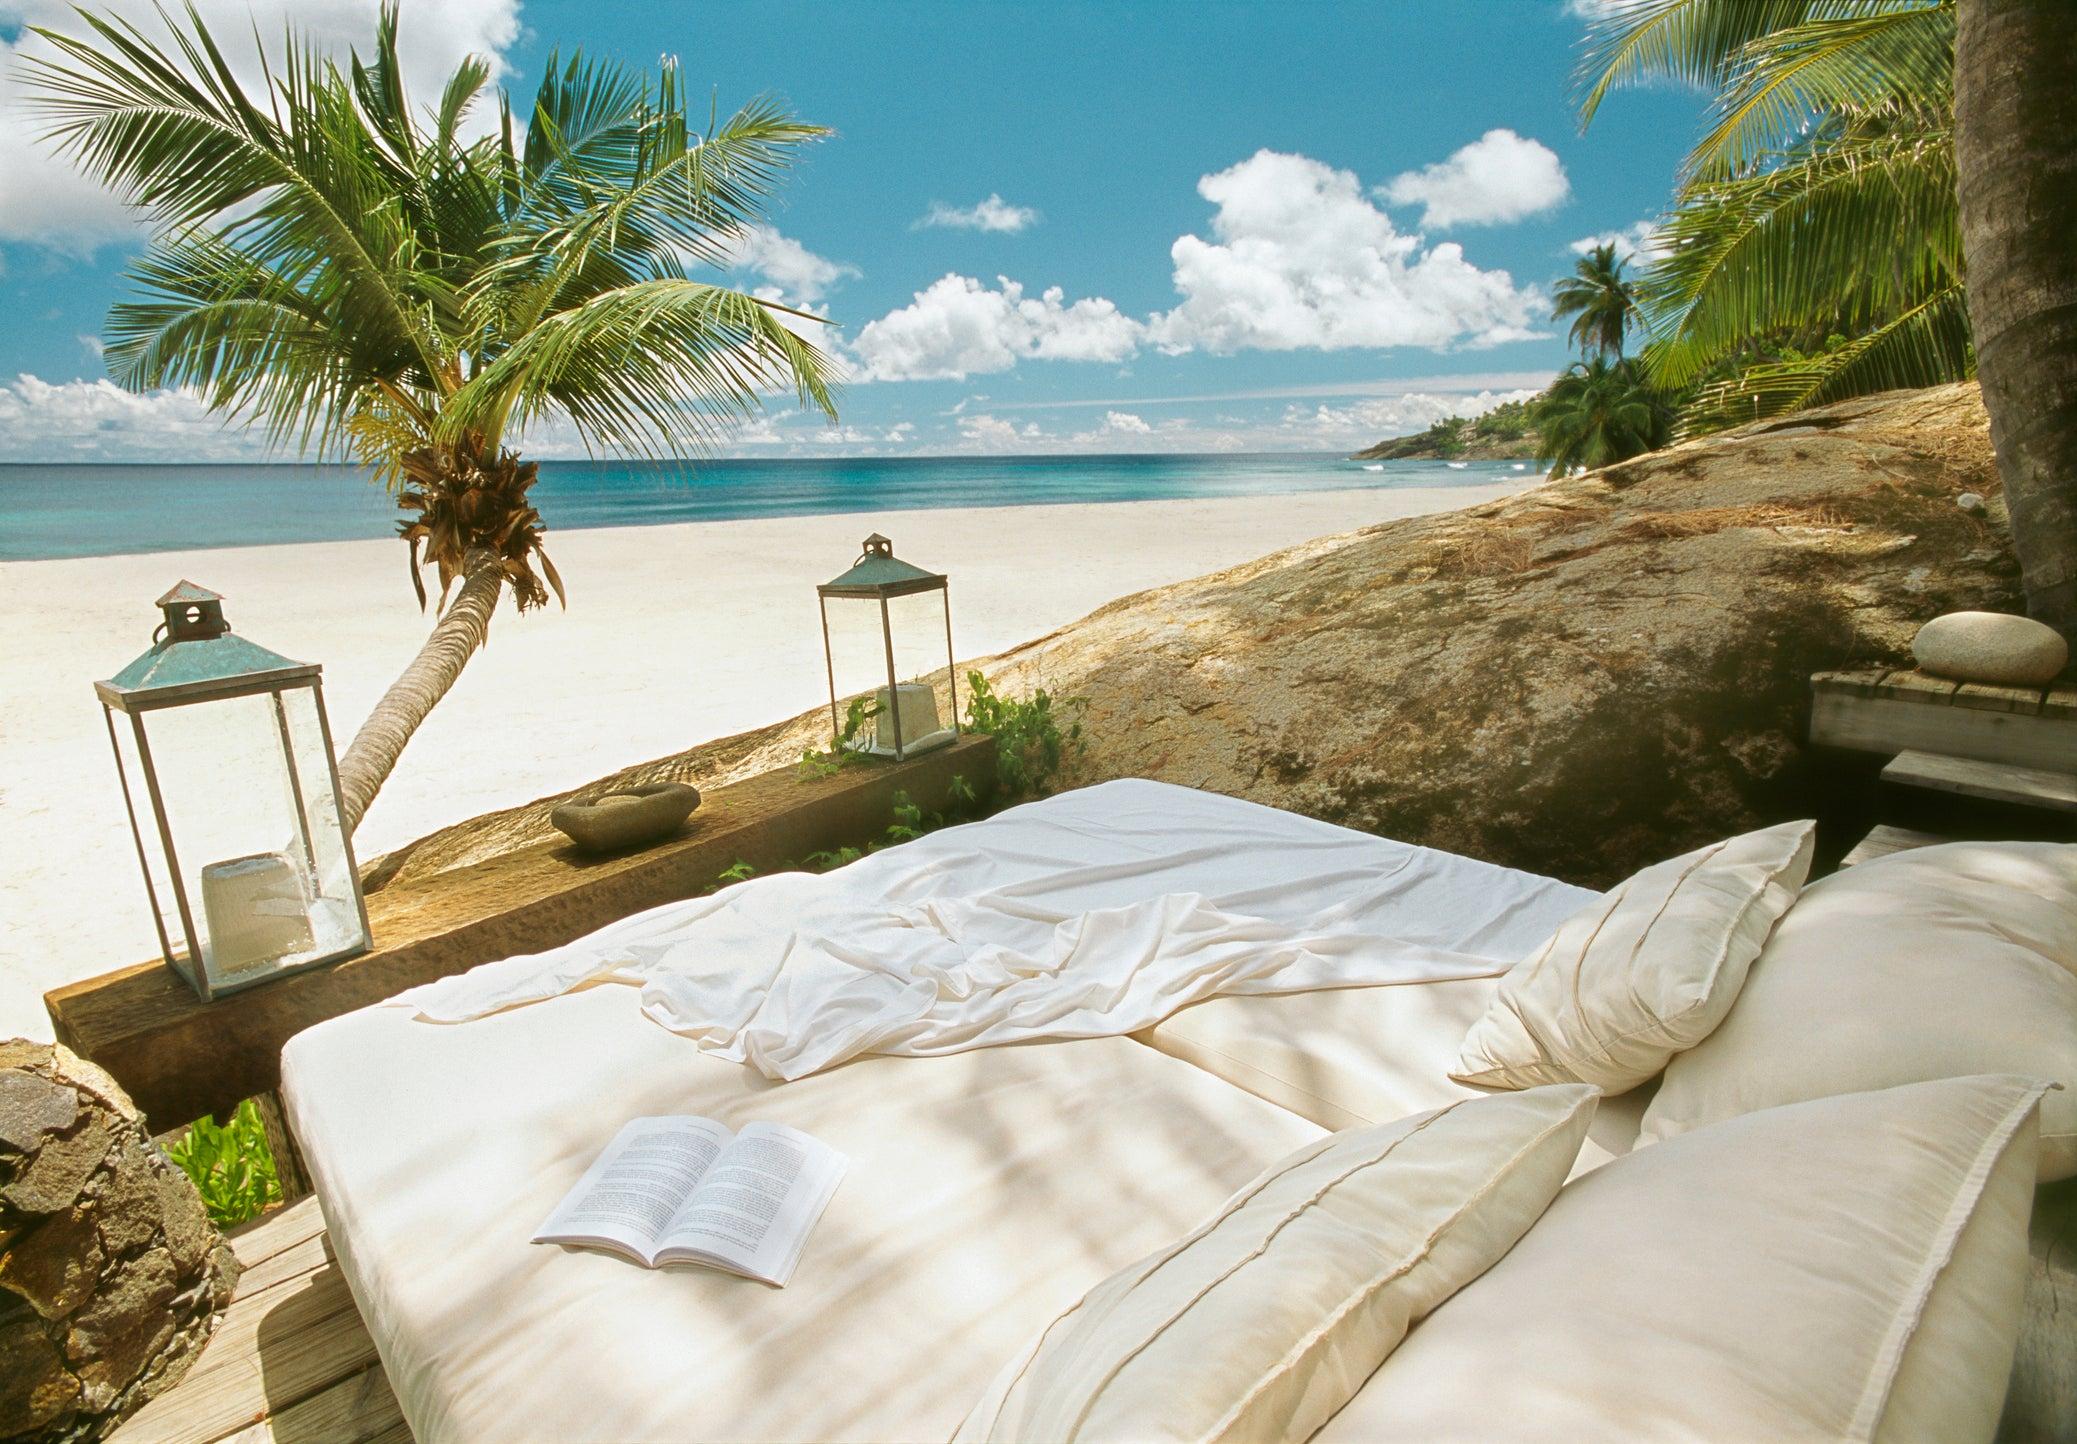 Seychelles, North Island, main beach